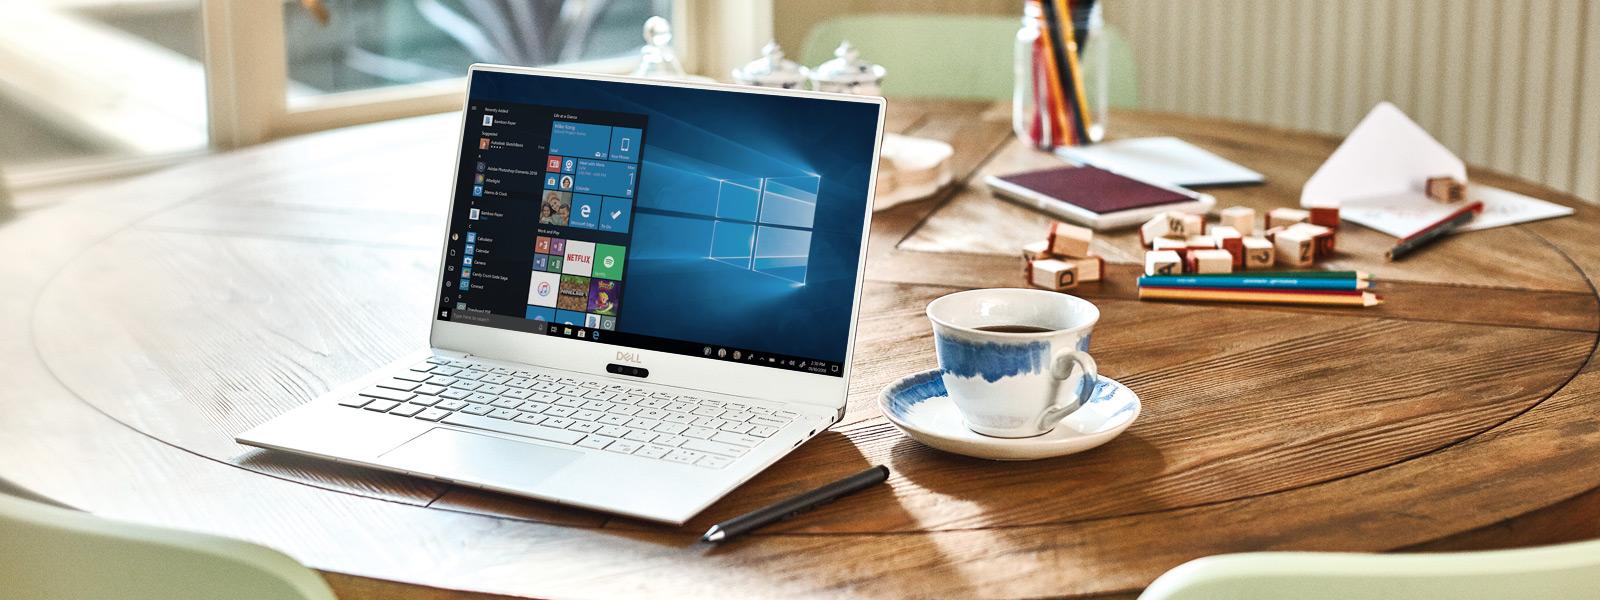 En Dell XPS 13 9370 står åben på et bord med en Windows 10-startskærm.